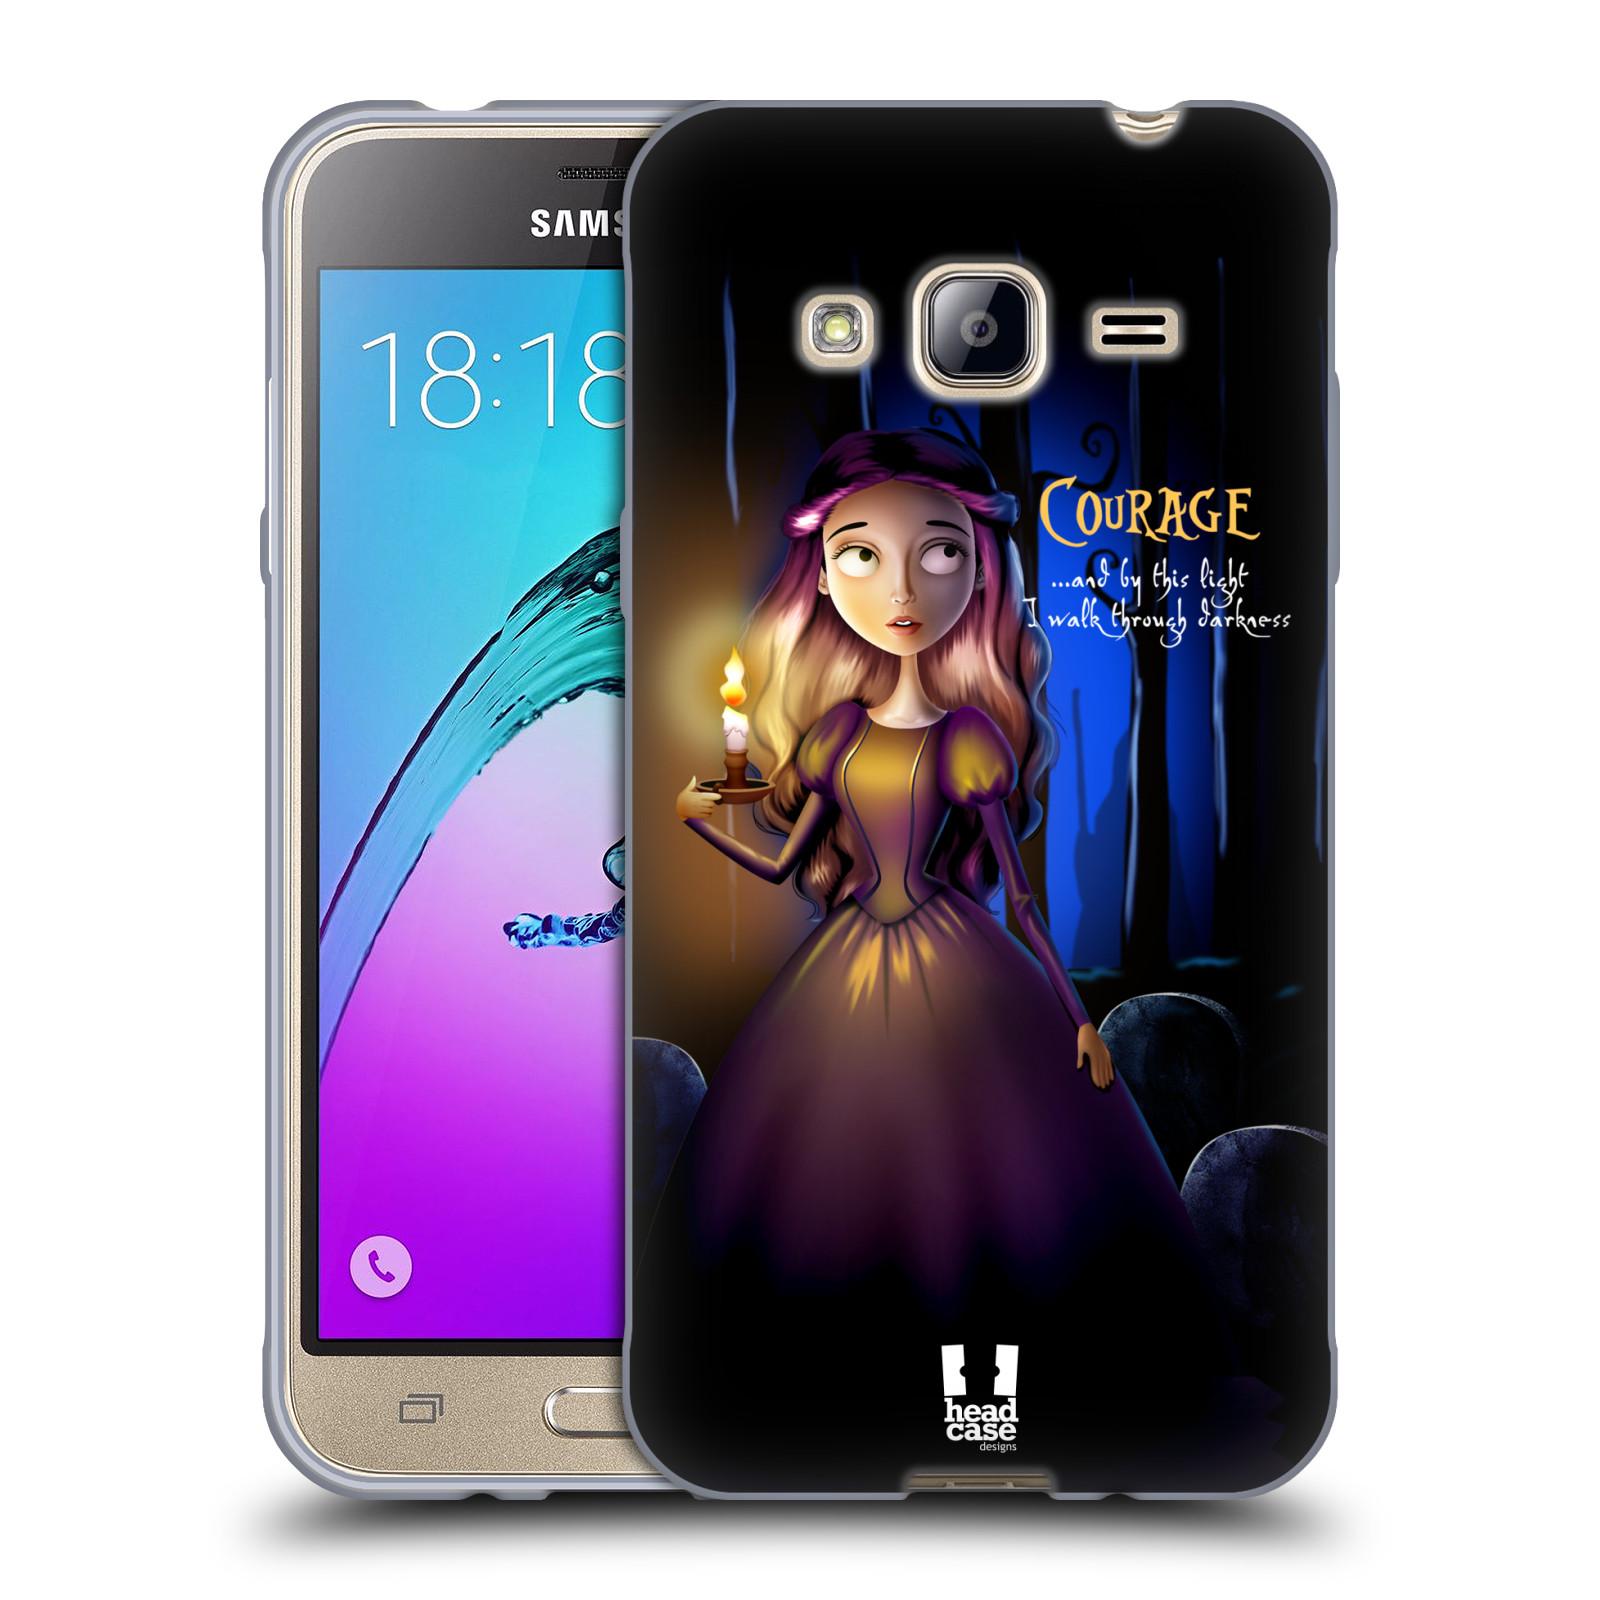 Silikonové pouzdro na mobil Samsung Galaxy J3 (2016) HEAD CASE MACABRE COURAGE